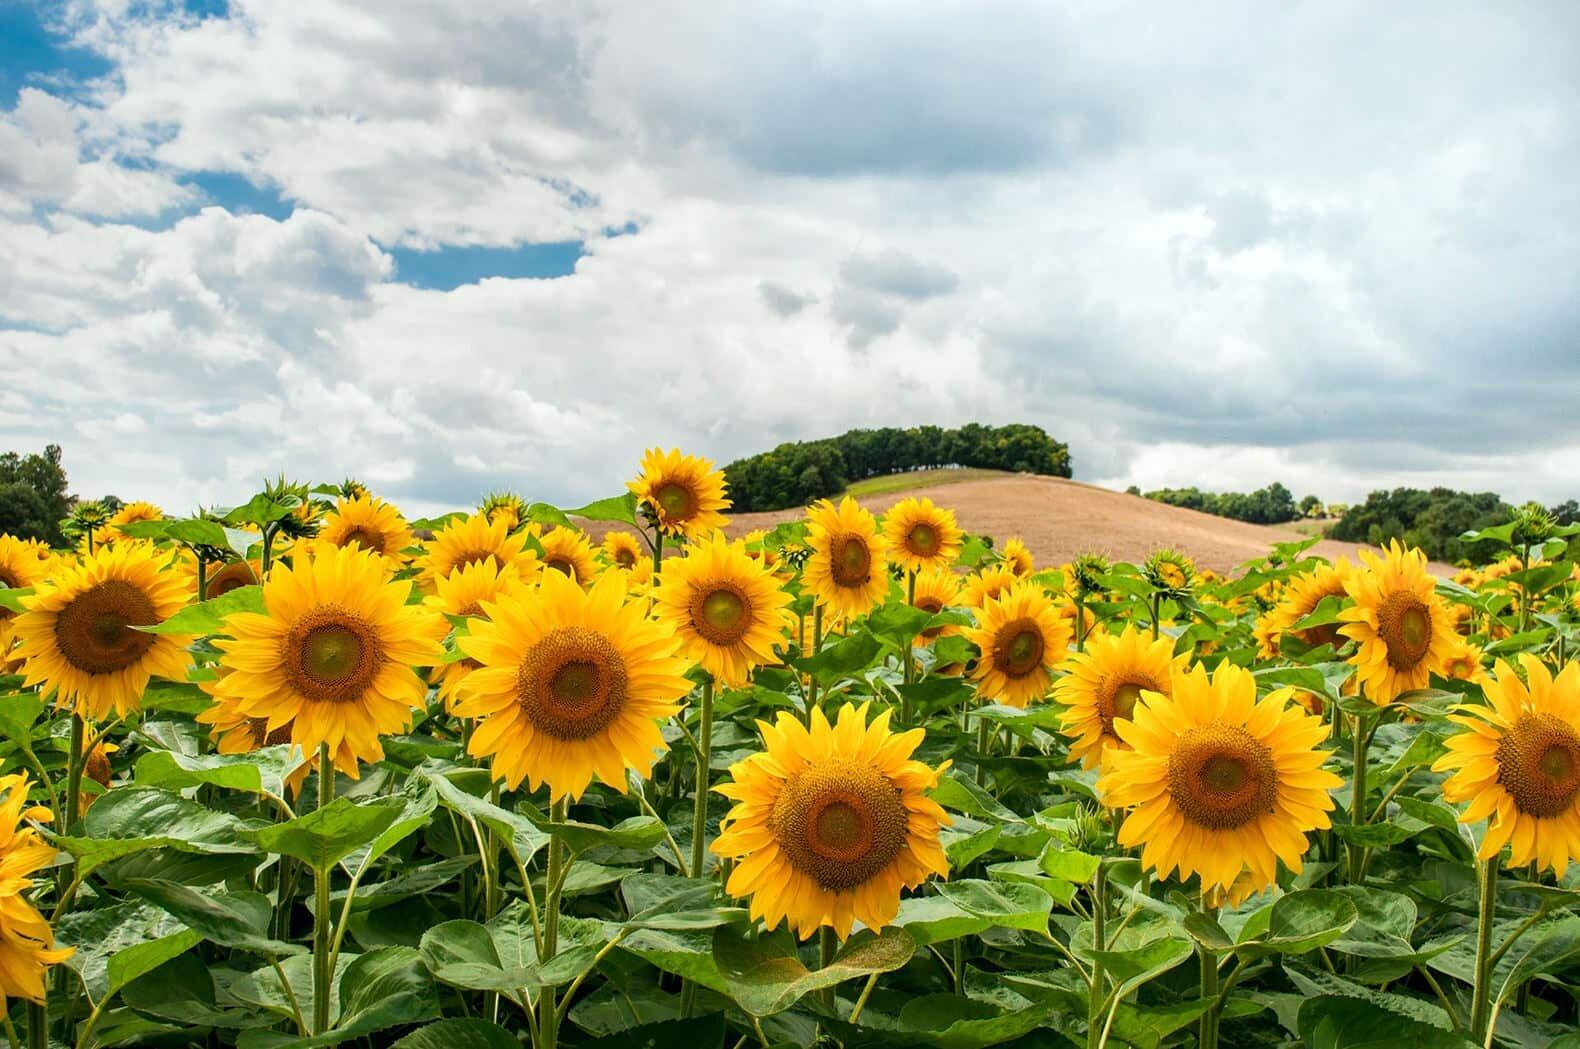 sunflowers growing in a farm